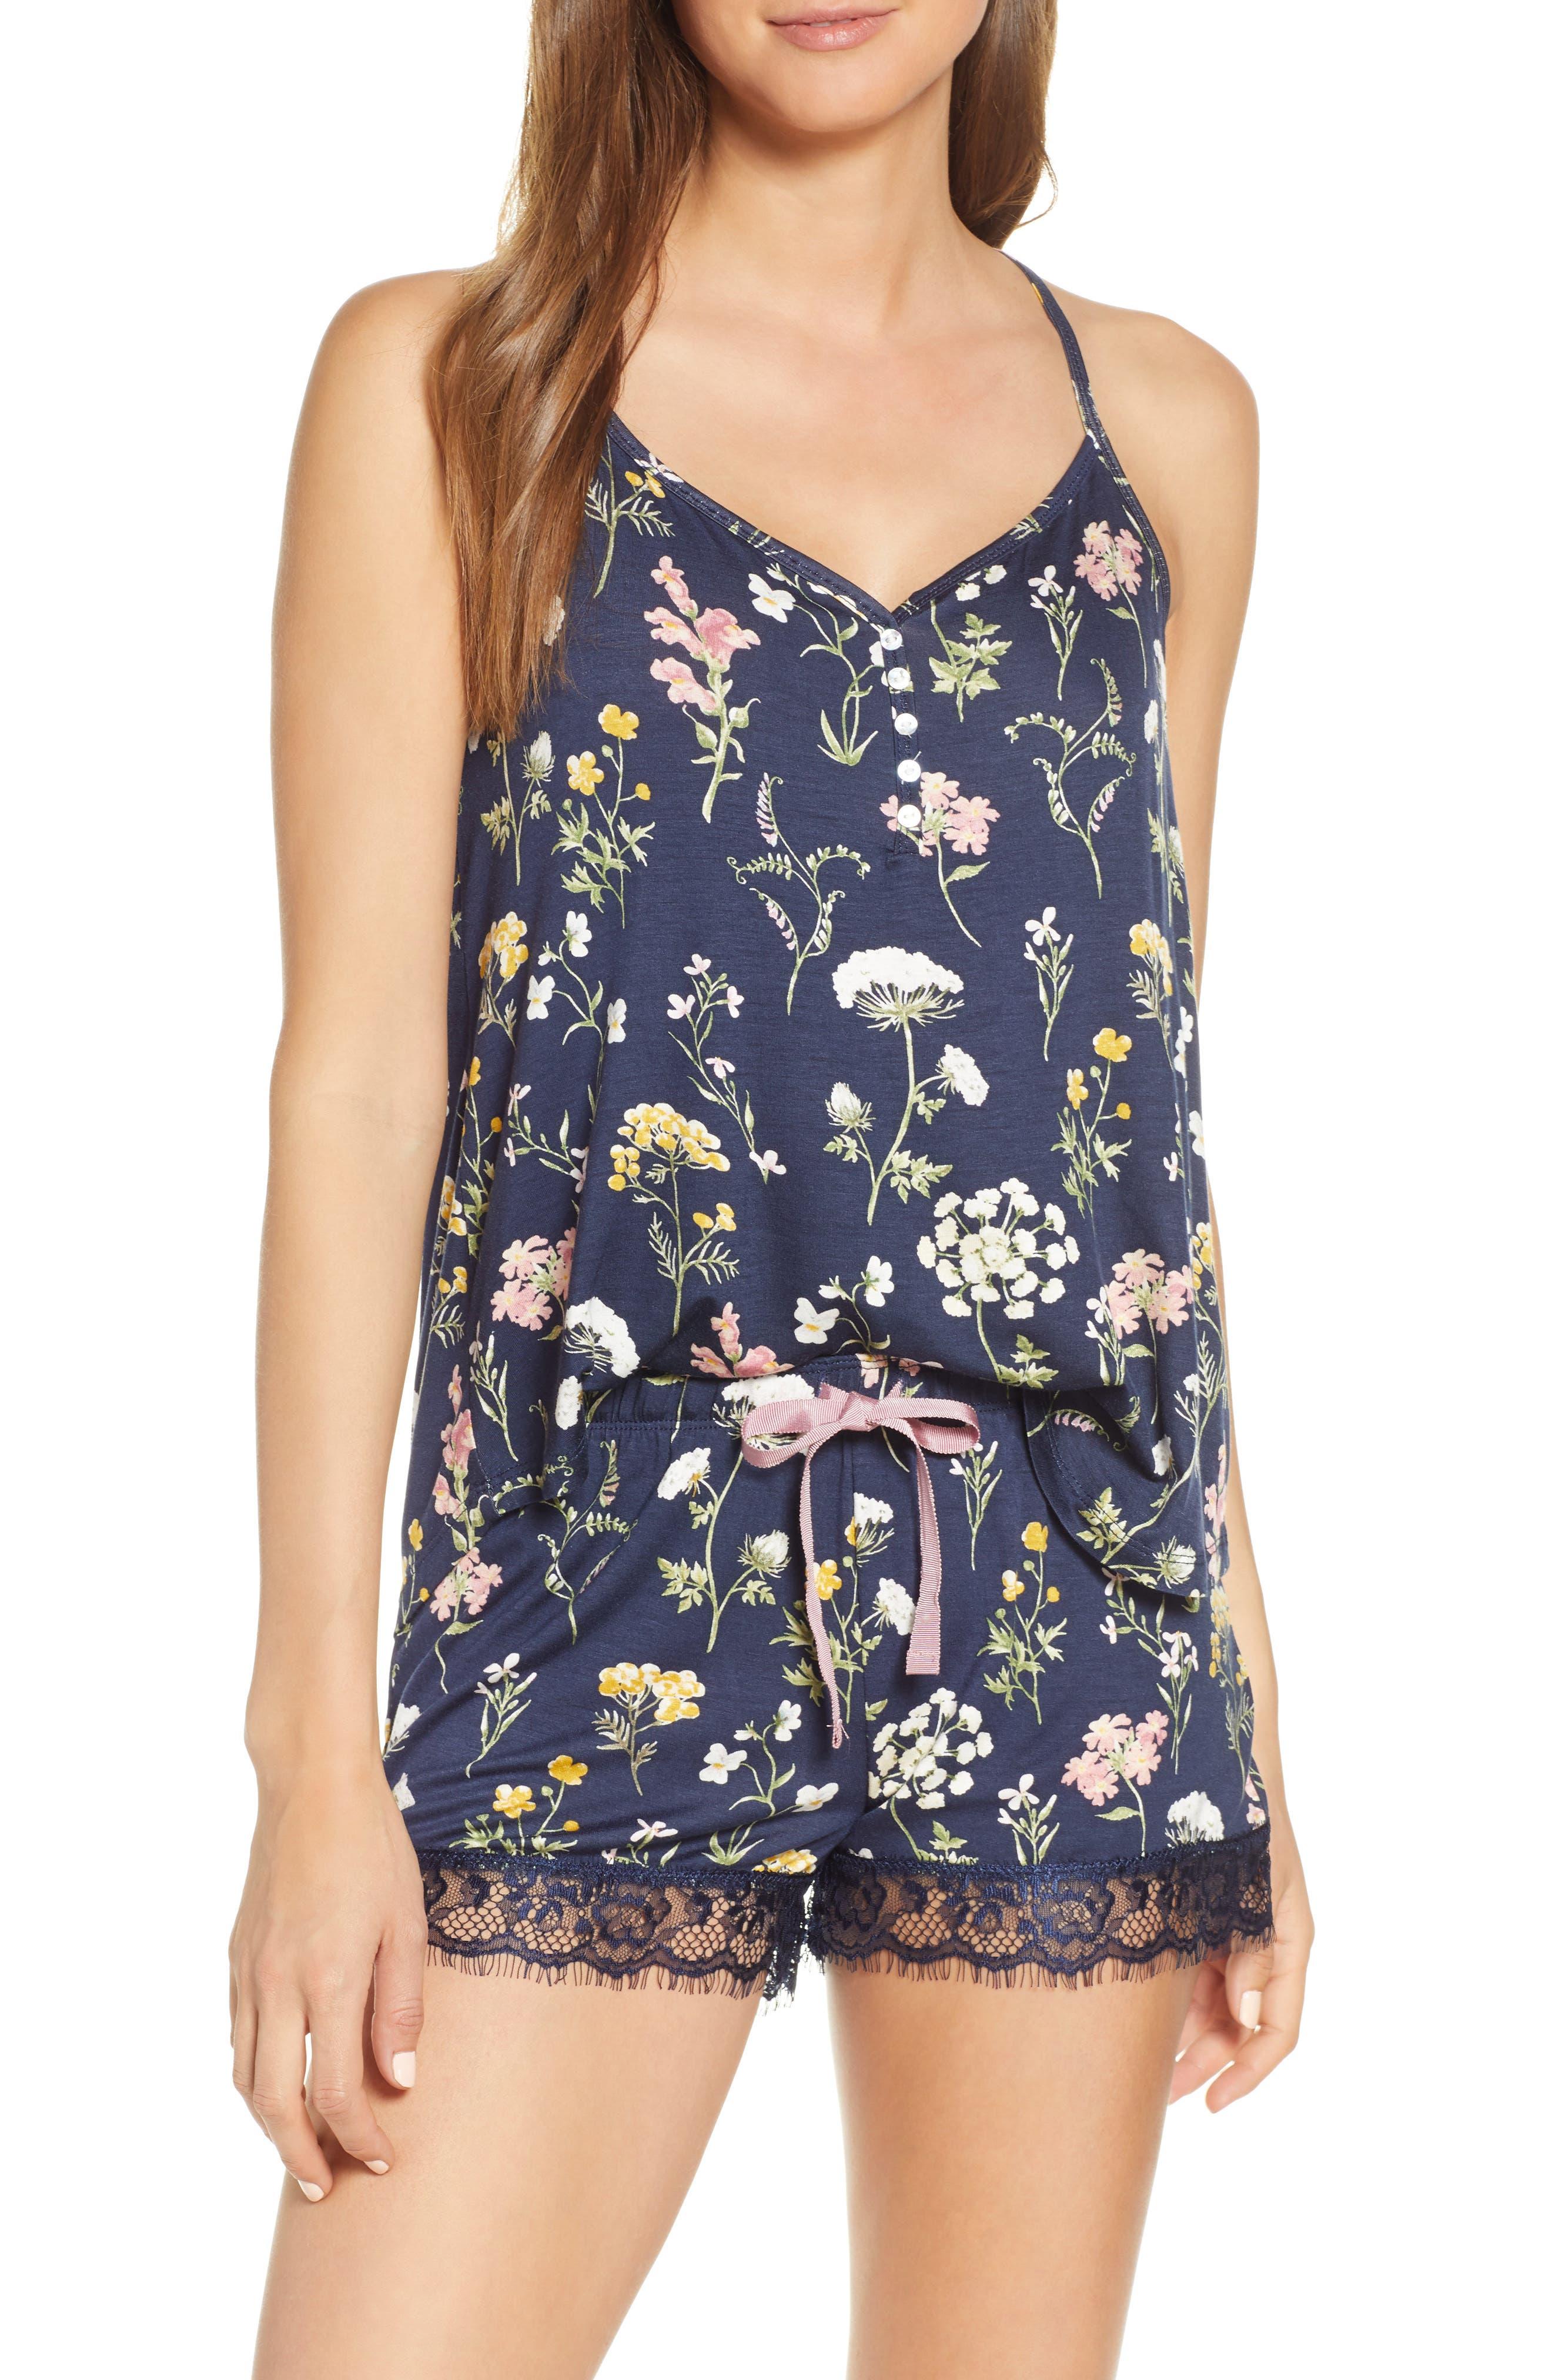 Pj Salvage Dreams Bloom Pajama Shorts, Blue